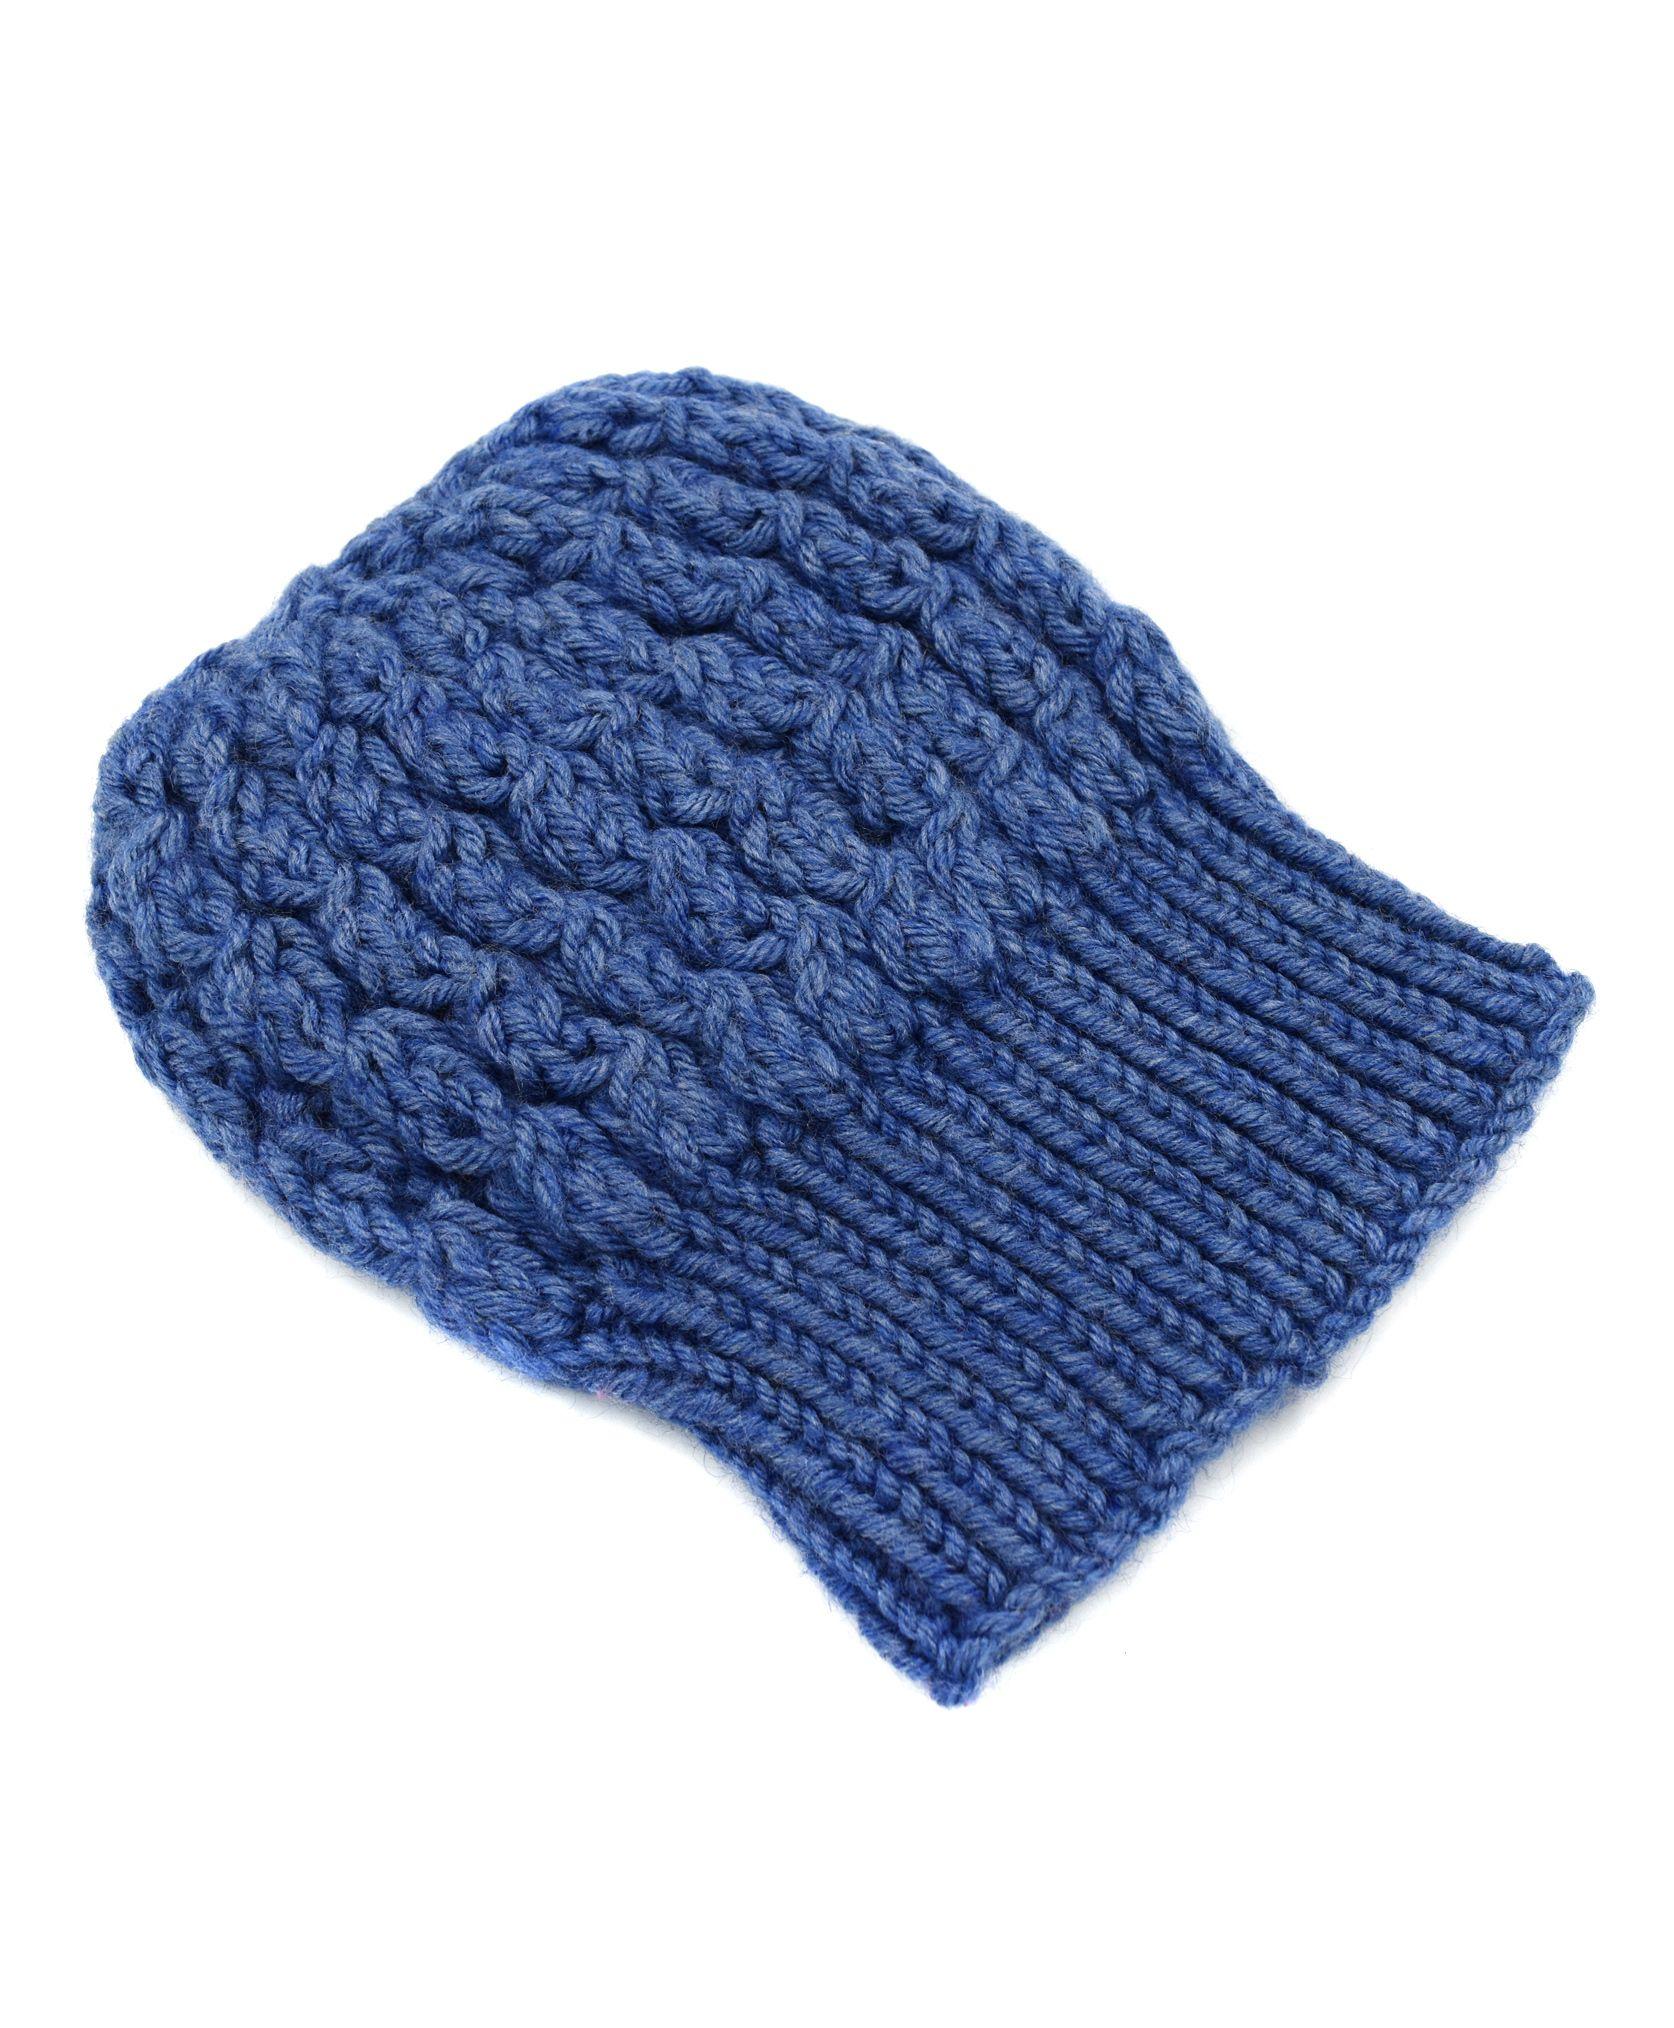 d999346af6b Magic Needles Winter Wear Slouch Shroom Beanie Cap Dark Blue ...